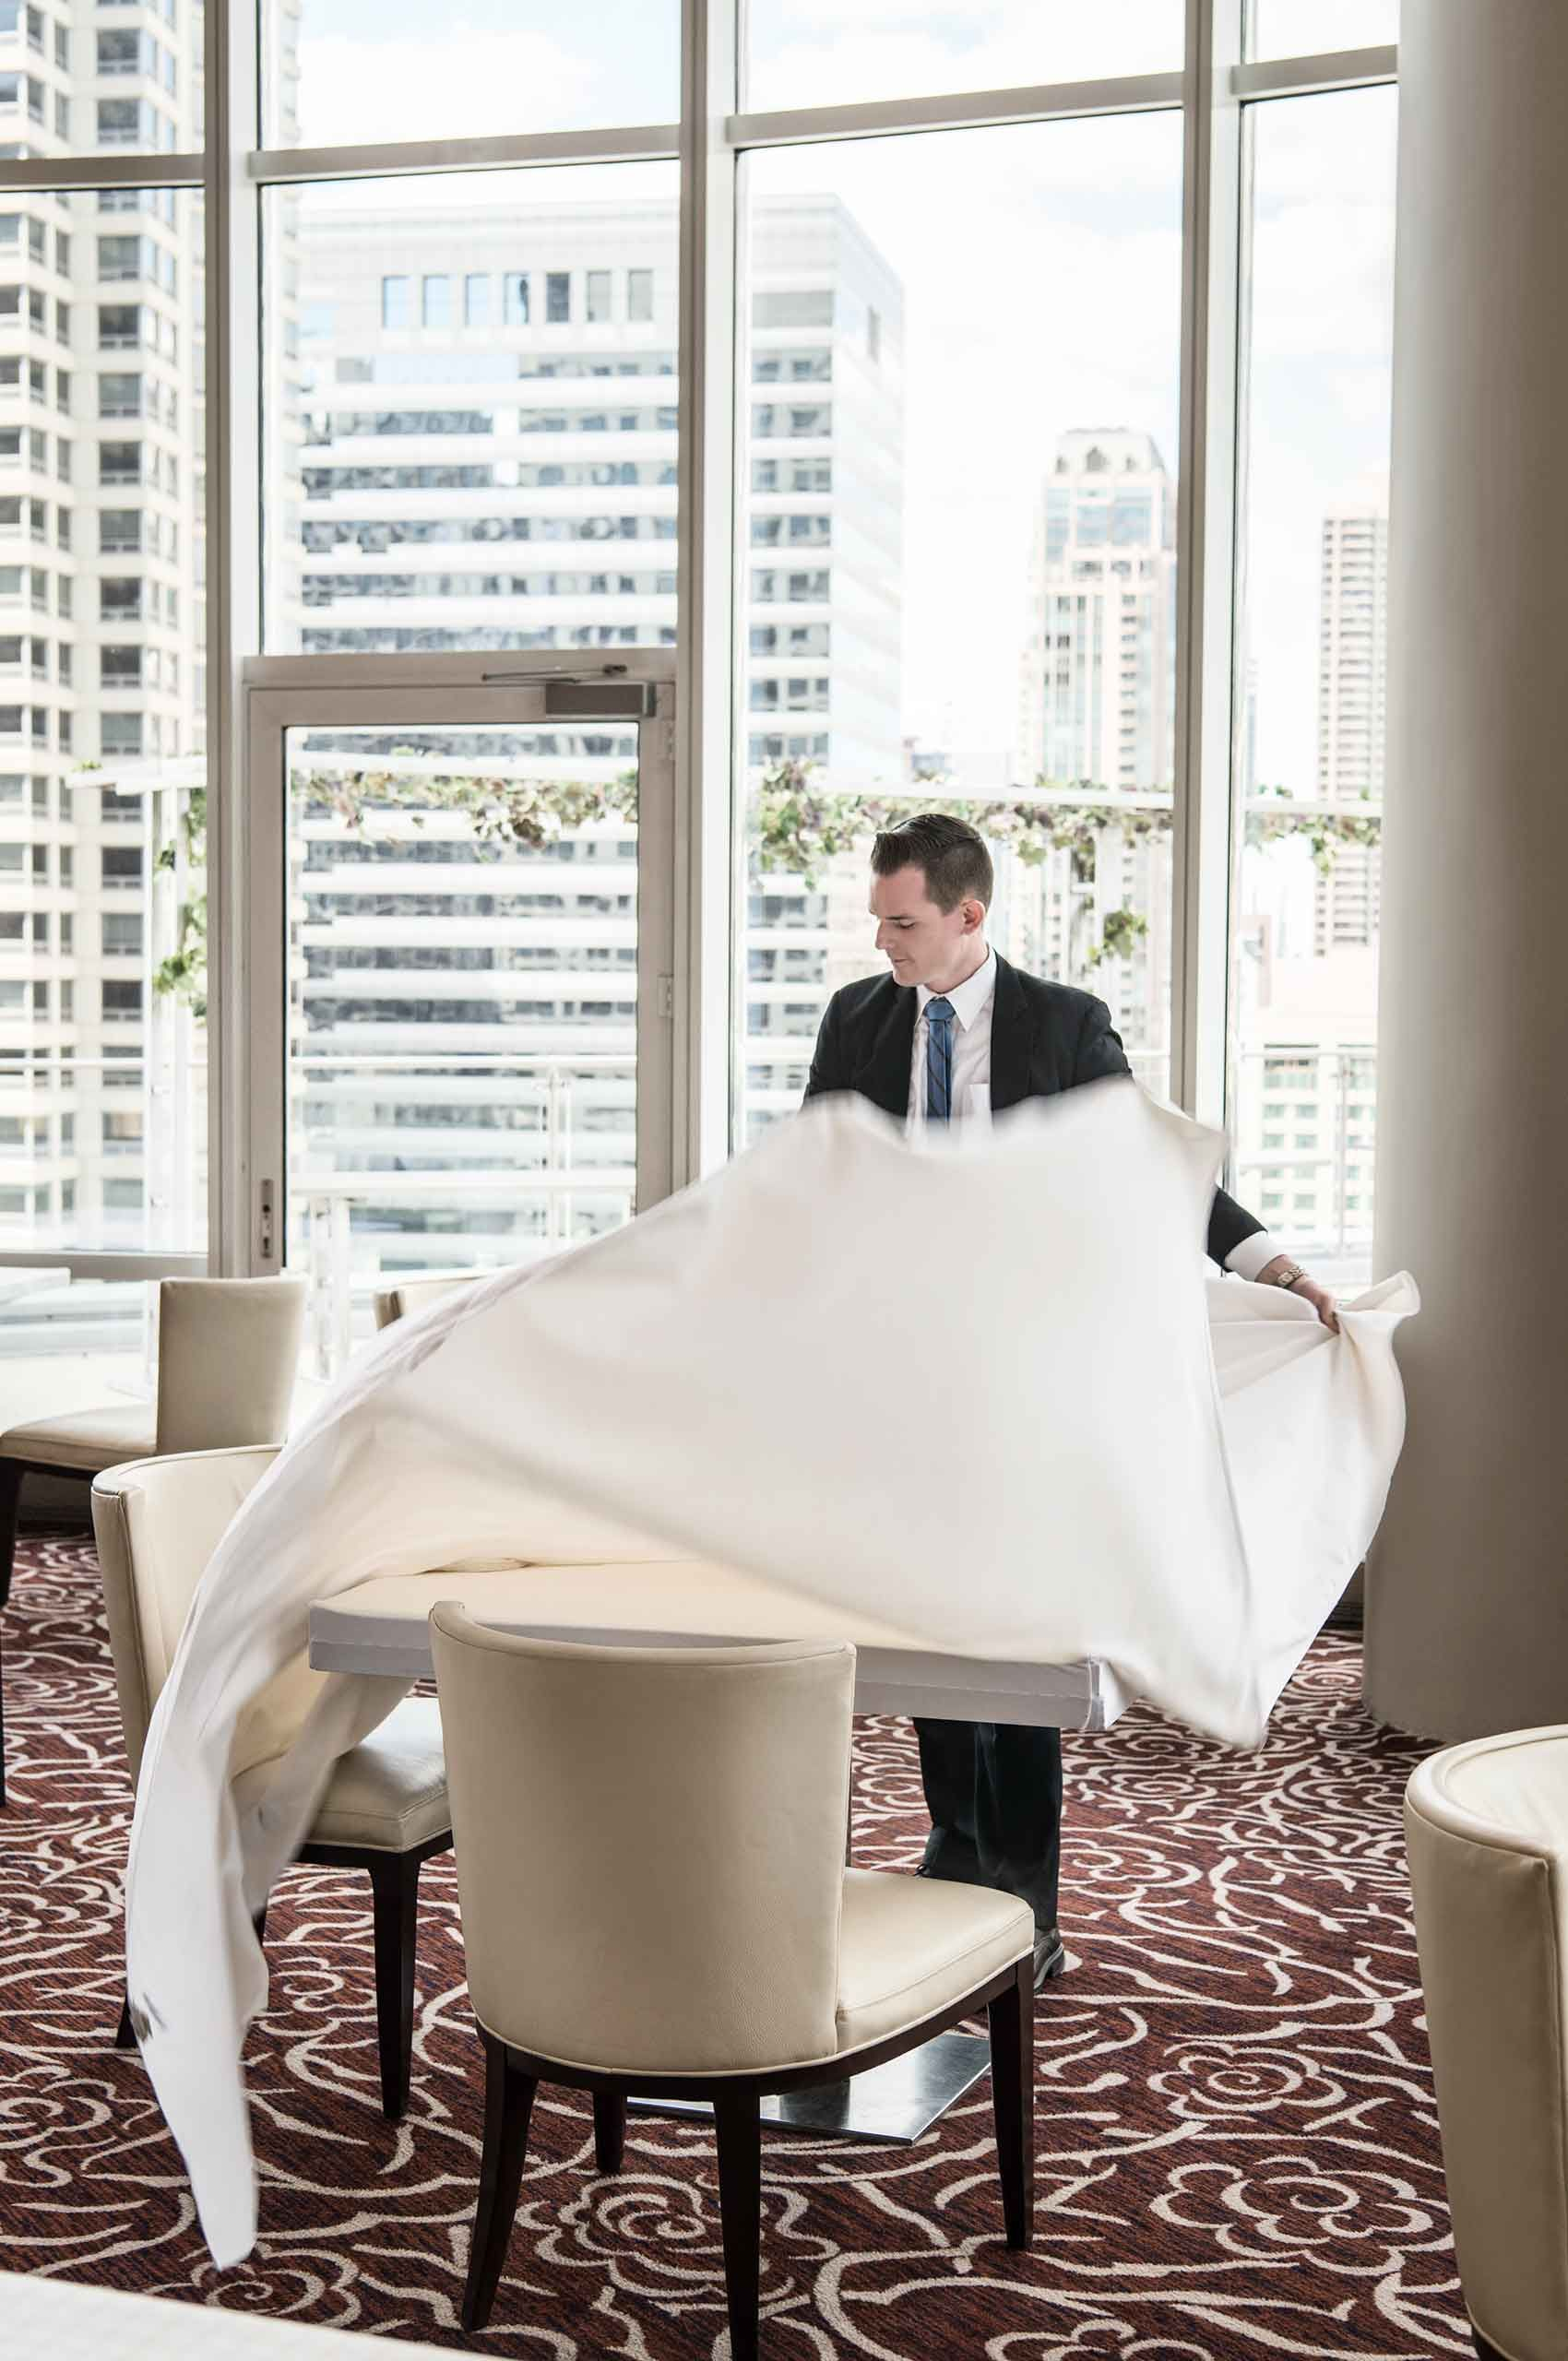 Waiter-setting-tablecloth-by-HenrikOlundPhotography..jpg